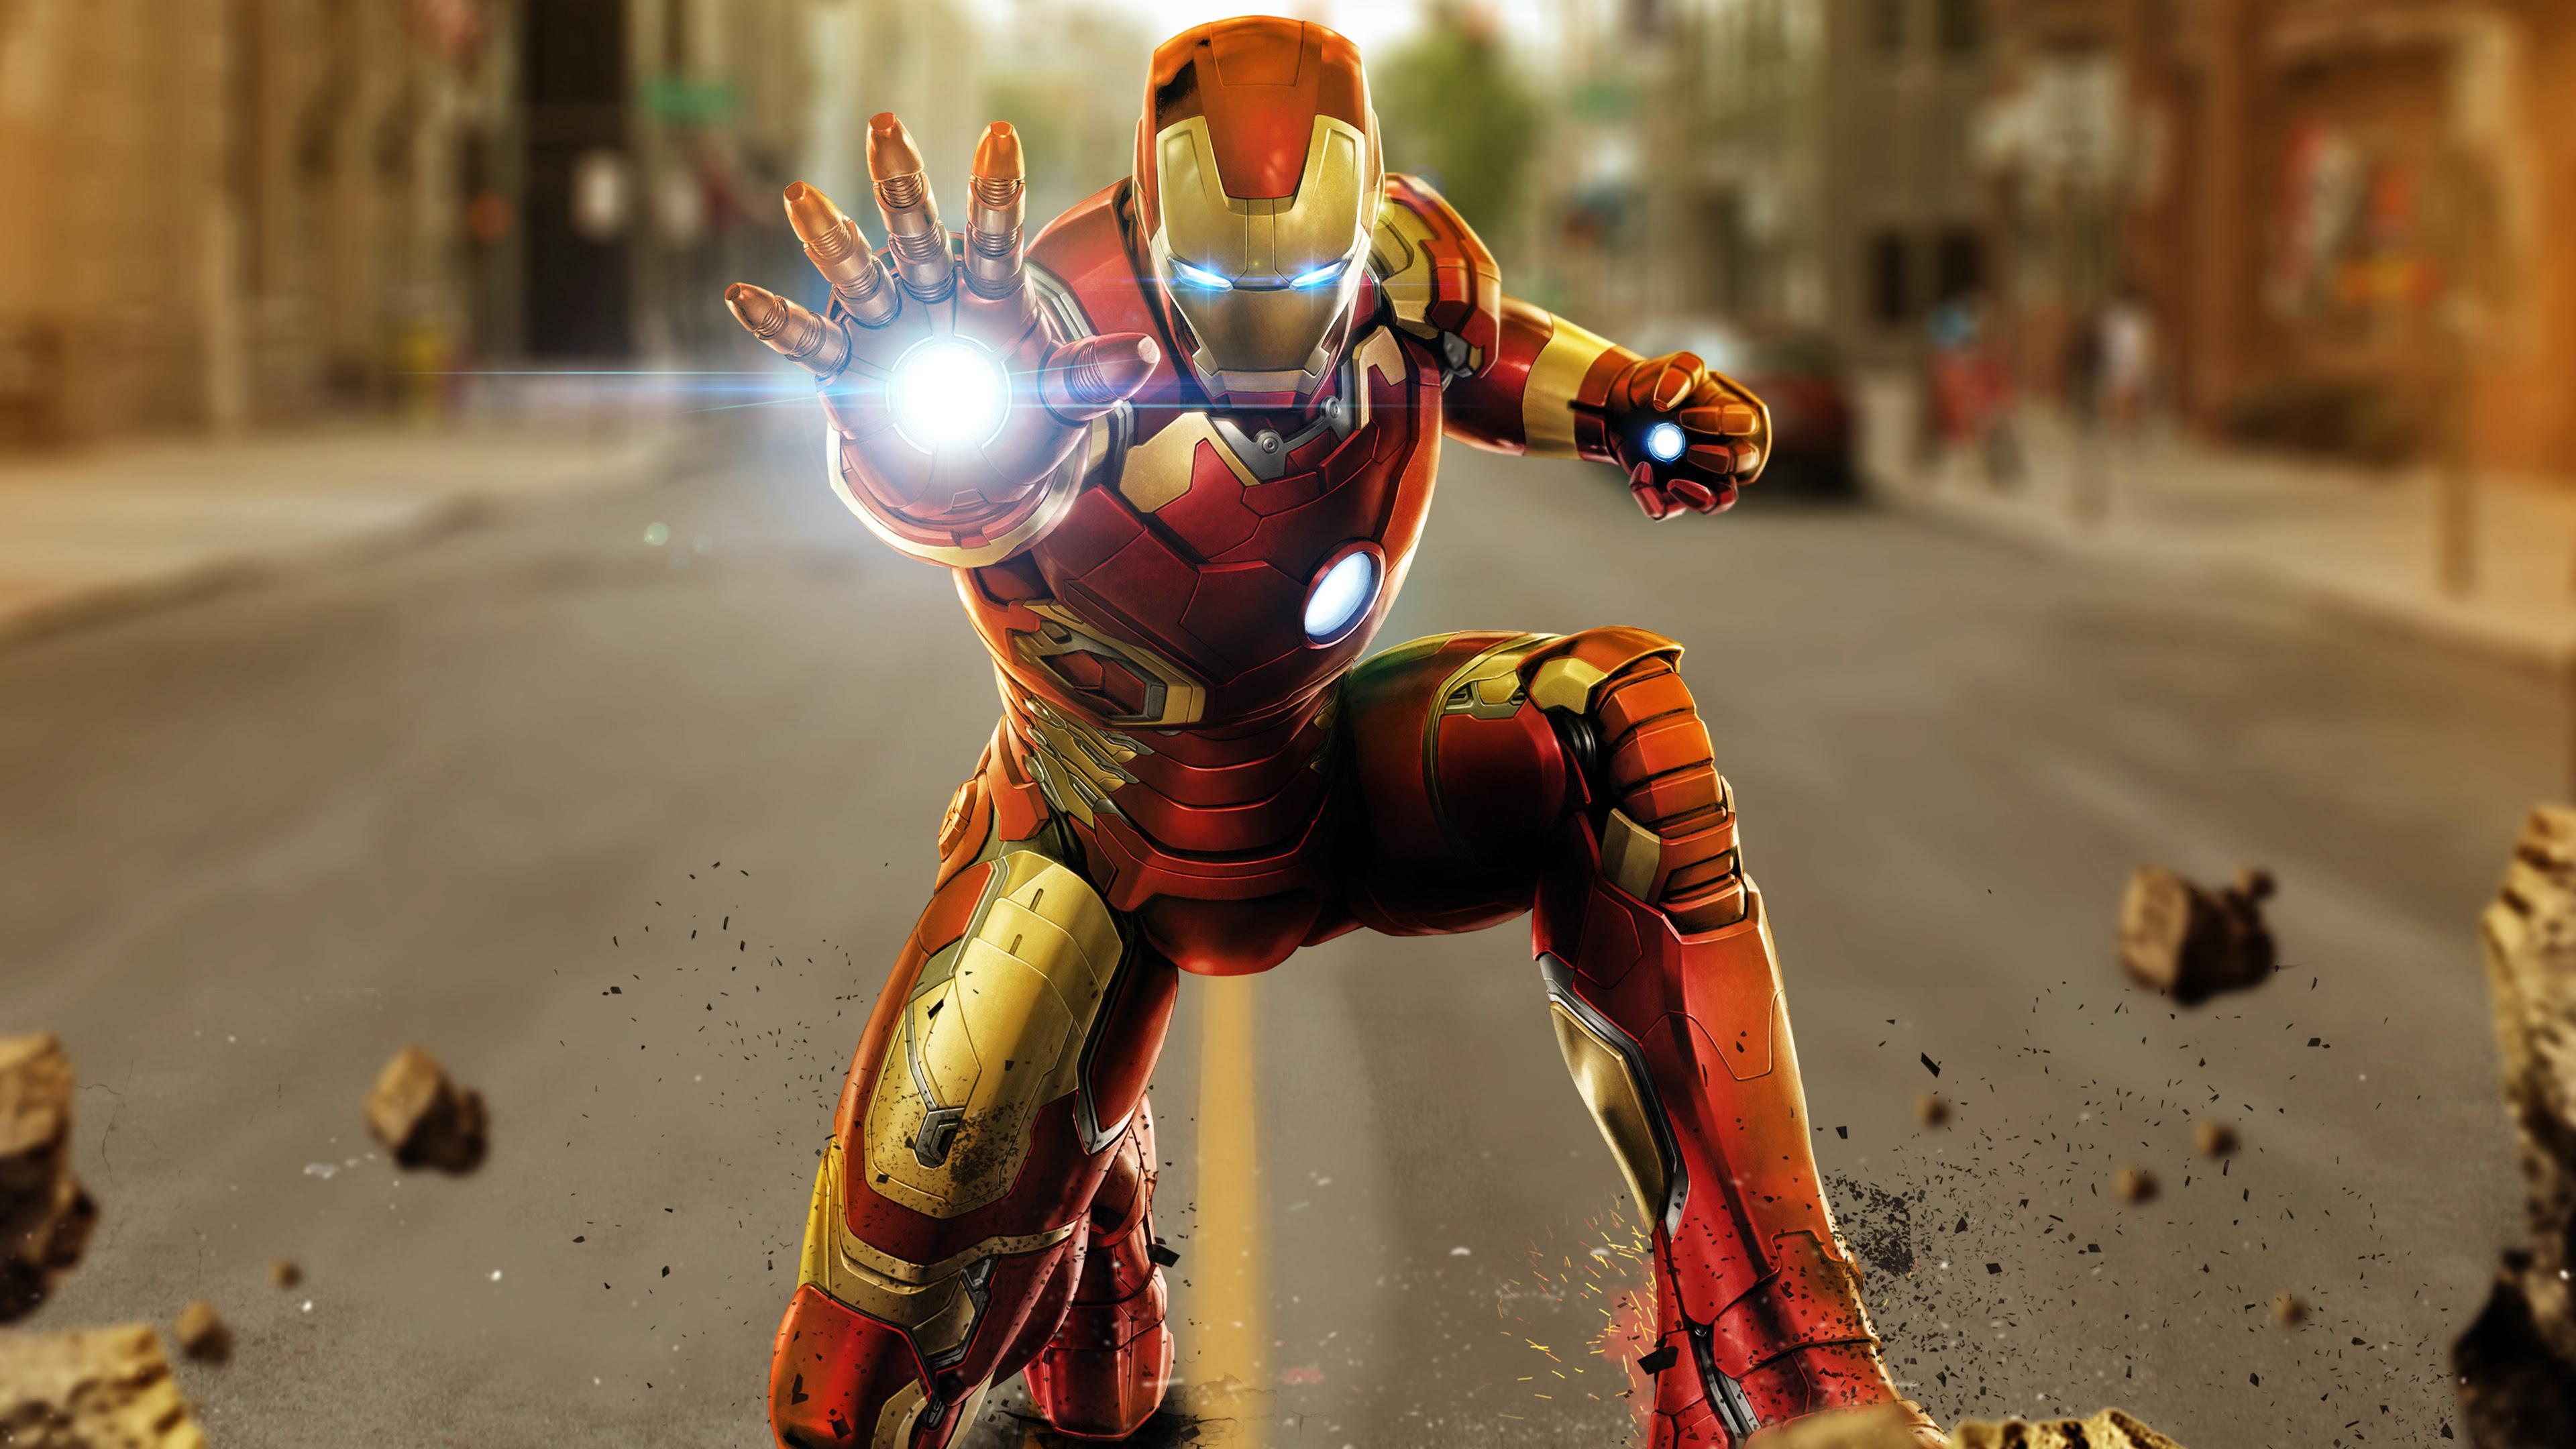 Iron Man Artwork 4k Wallpapers Hd Wallpapers